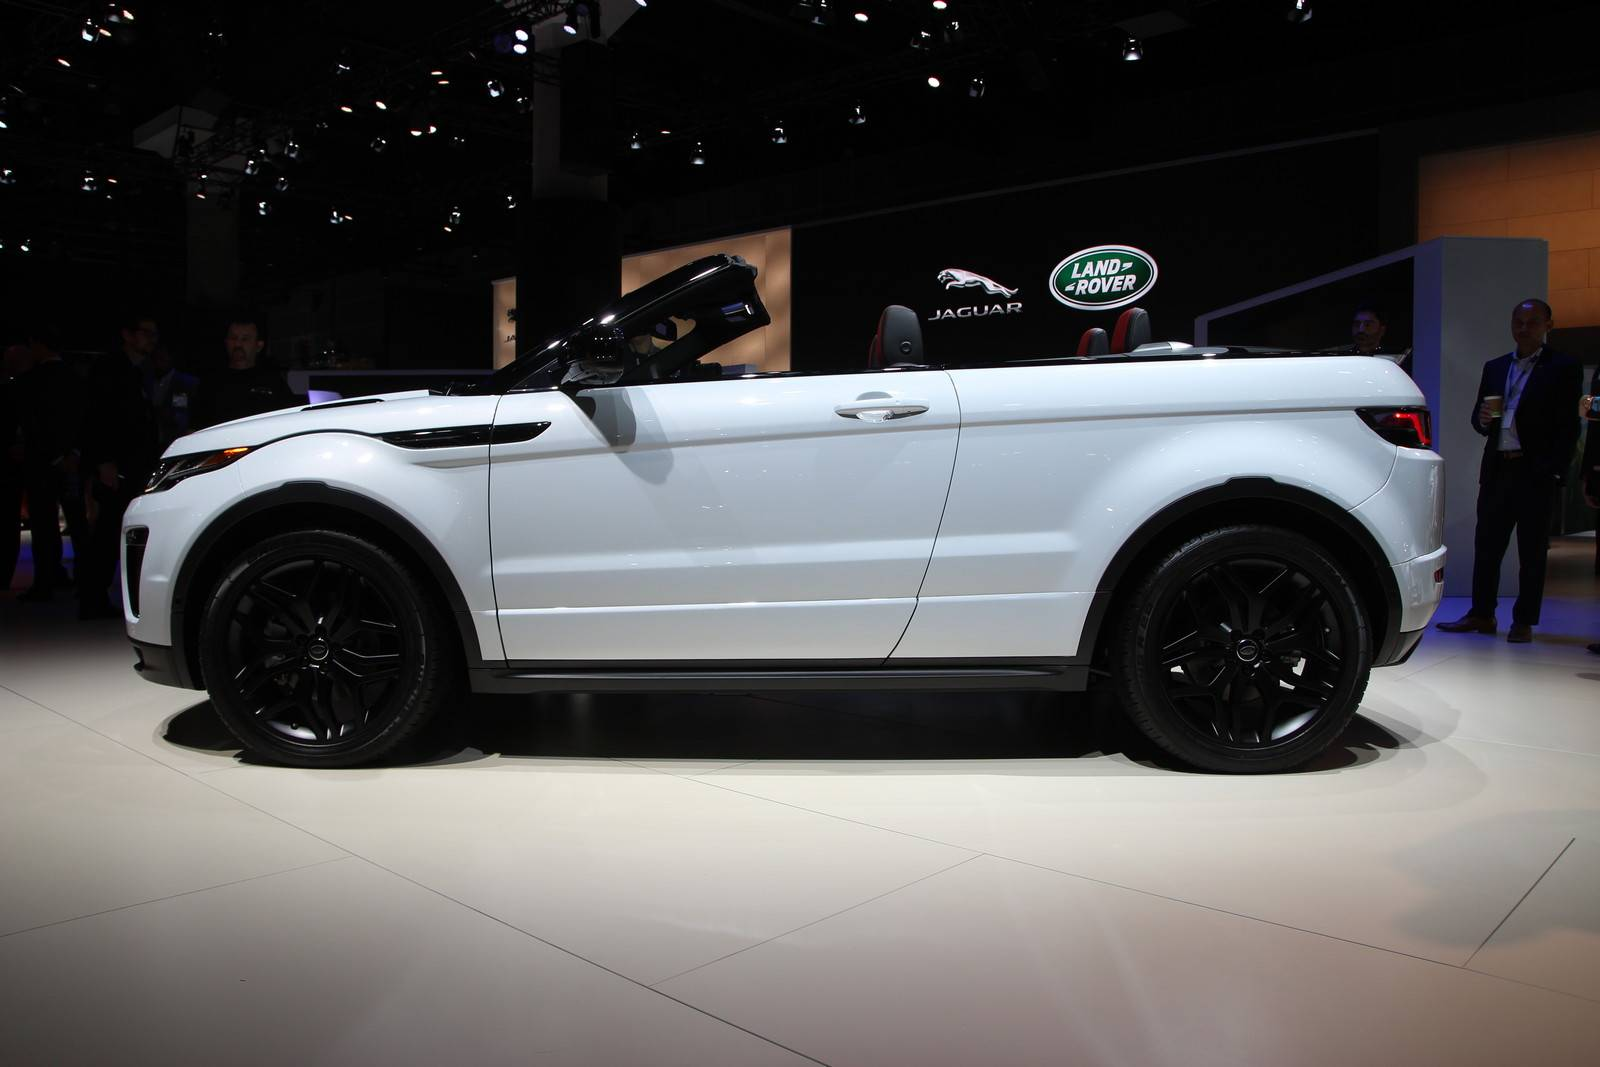 Range Rover Evoque Convertible side view